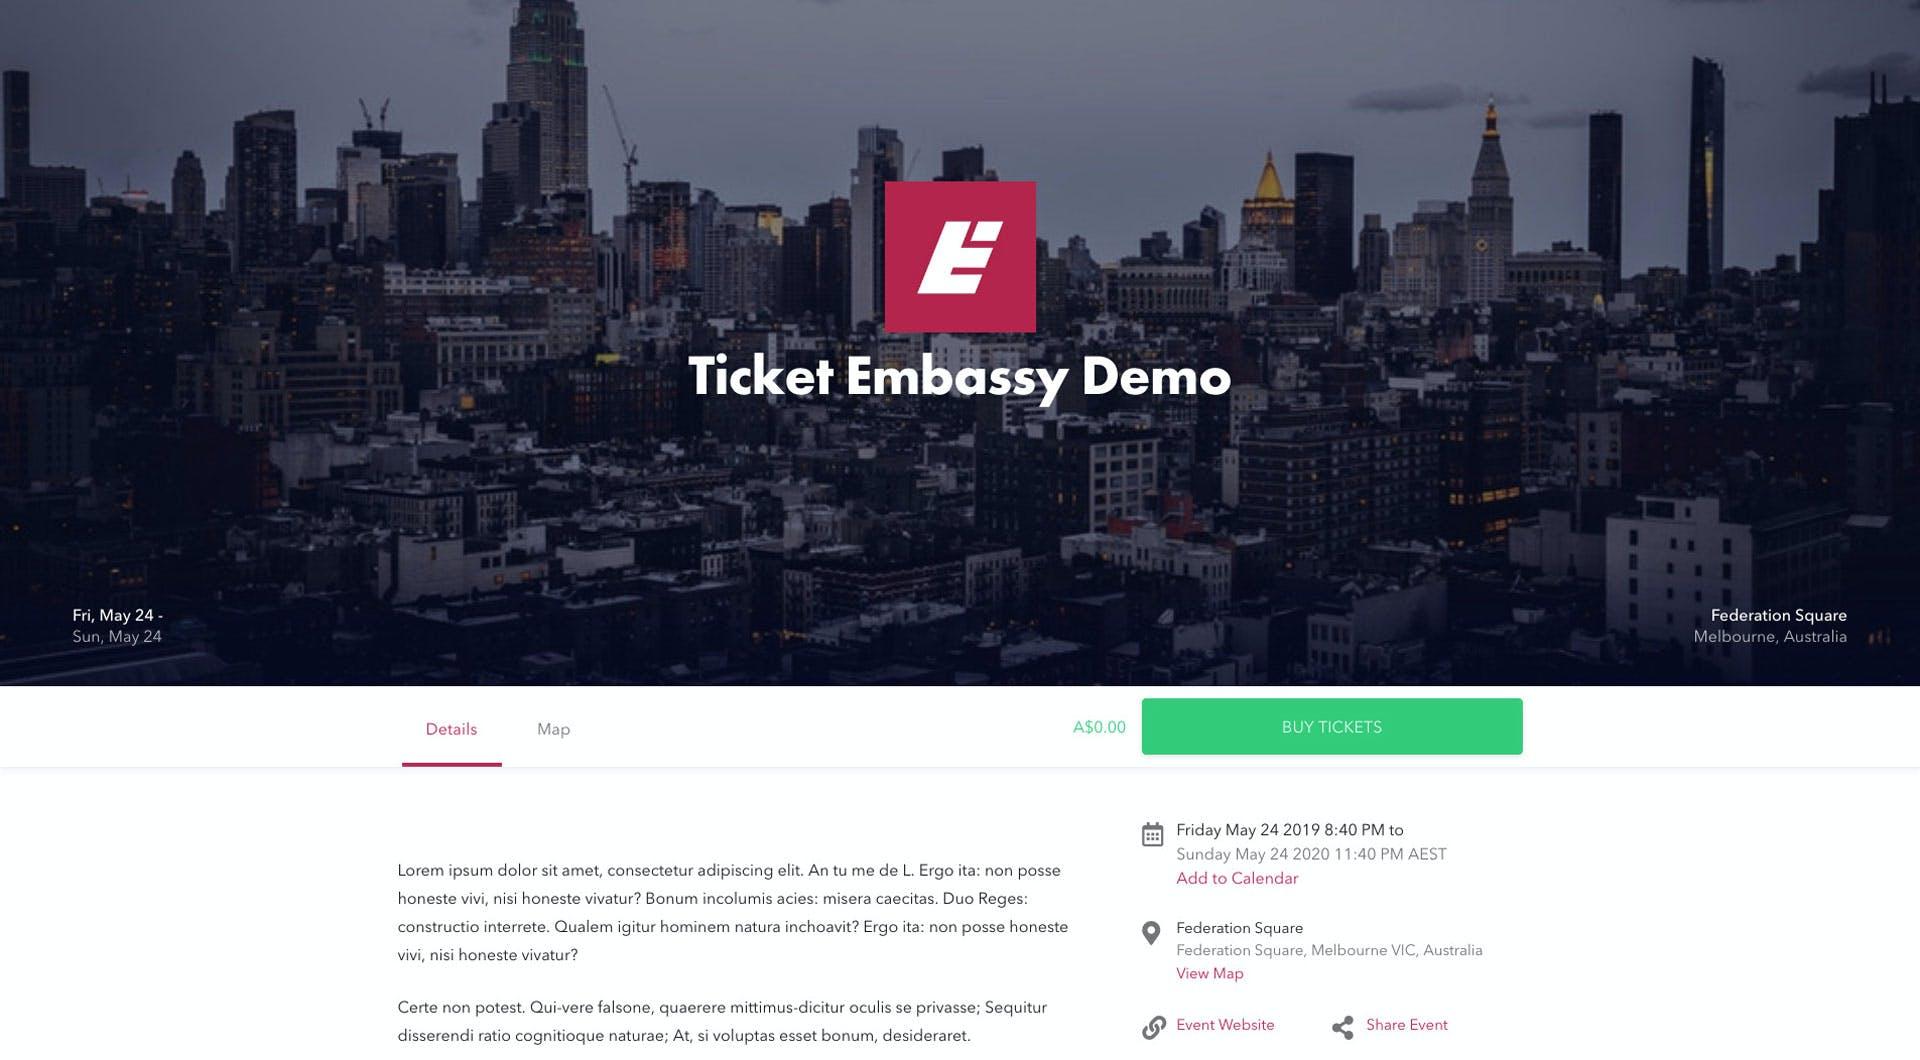 ticketembassy.com eventpage